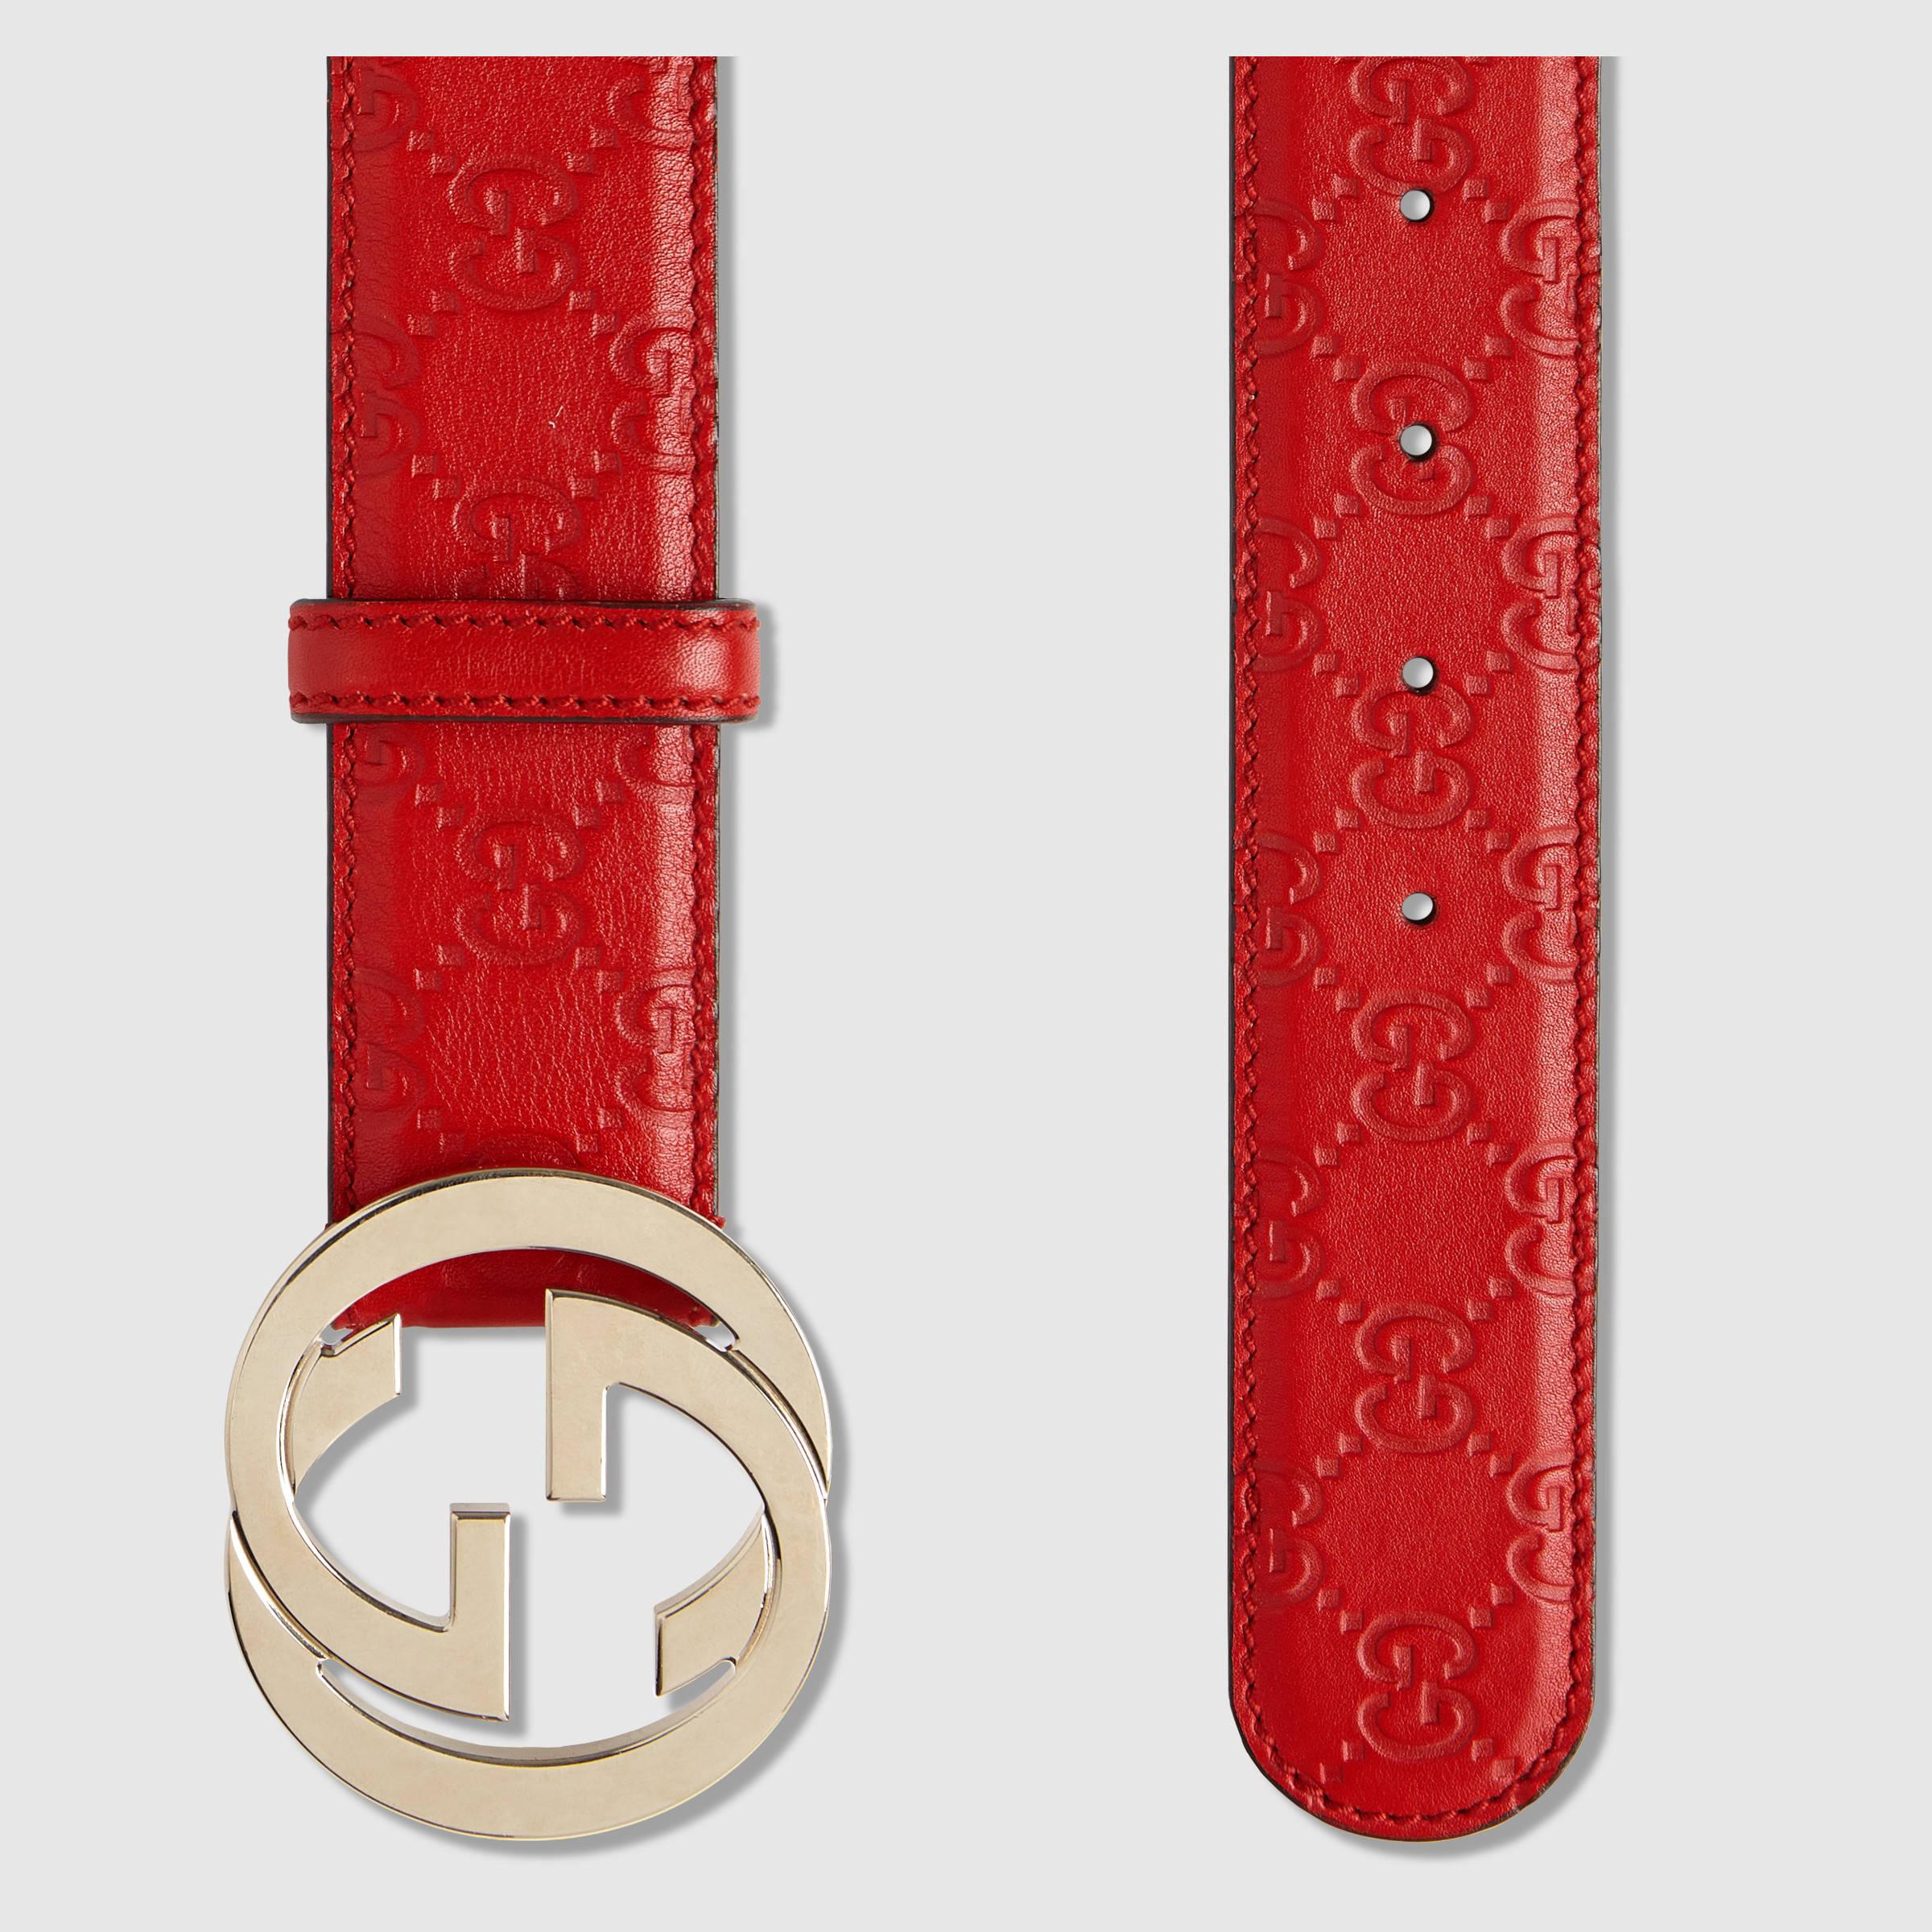 Versace Mens Belt | Red Gucci Belt | Gucci Belt White